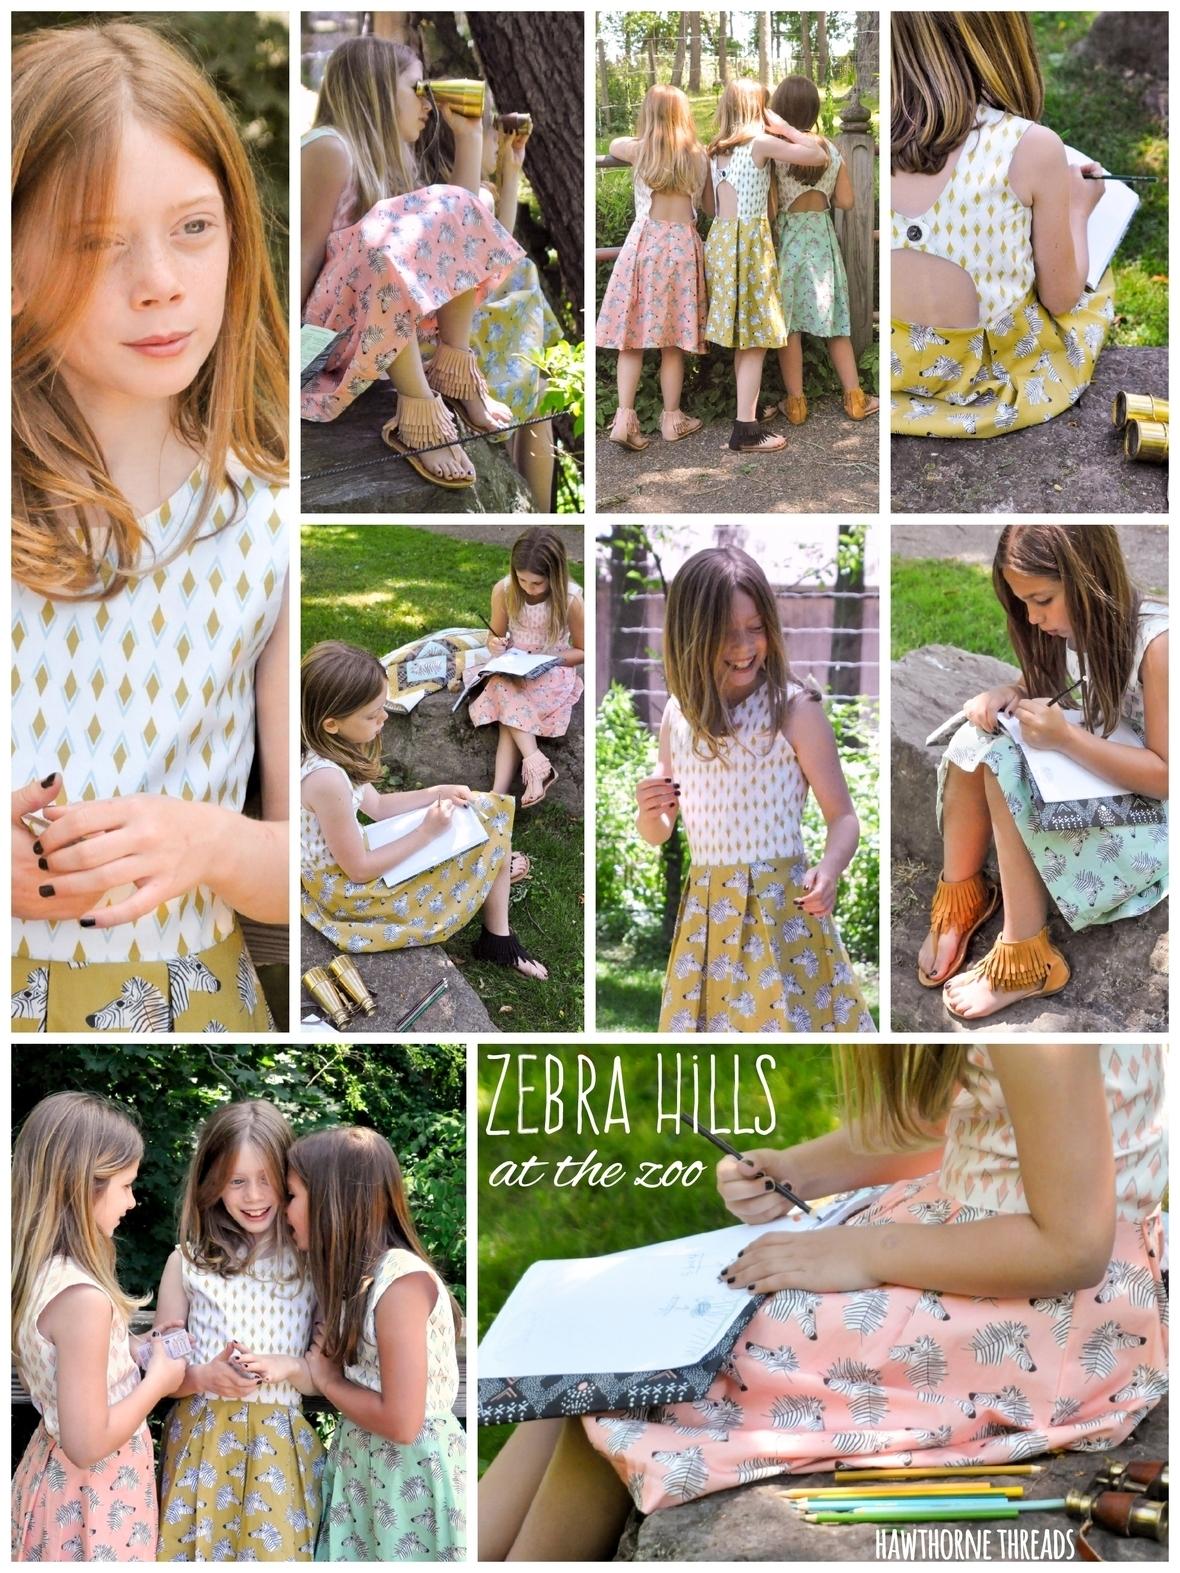 Zebra Hills Rebel Girl Party Dress